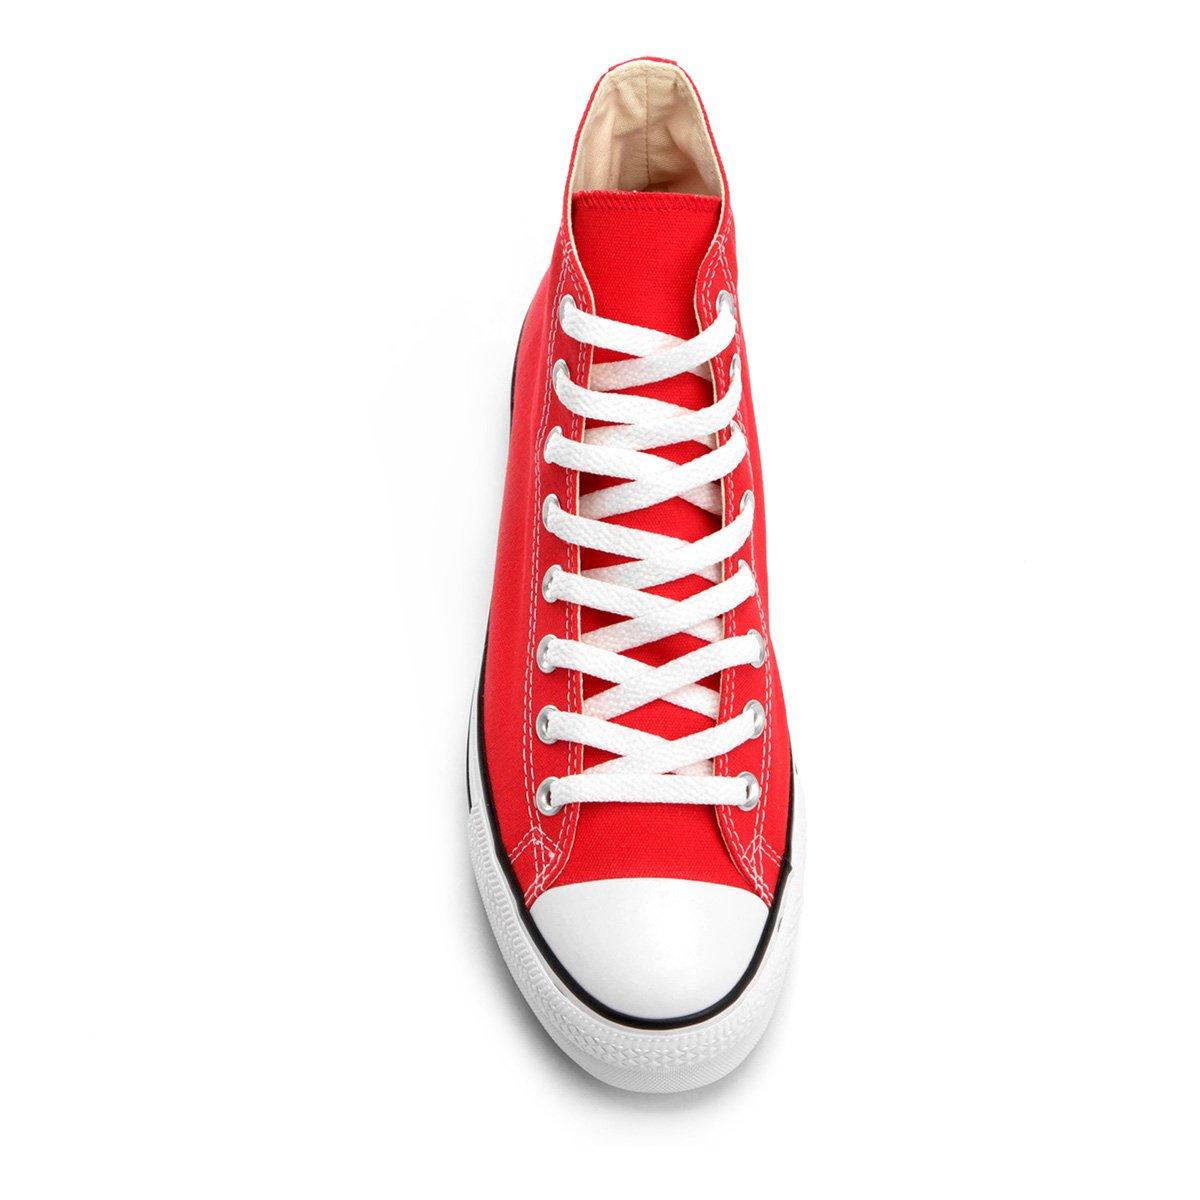 1698f7a575 Tênis Converse Chuck Taylor All Star Platform Hi - Vermelho - Compre ...